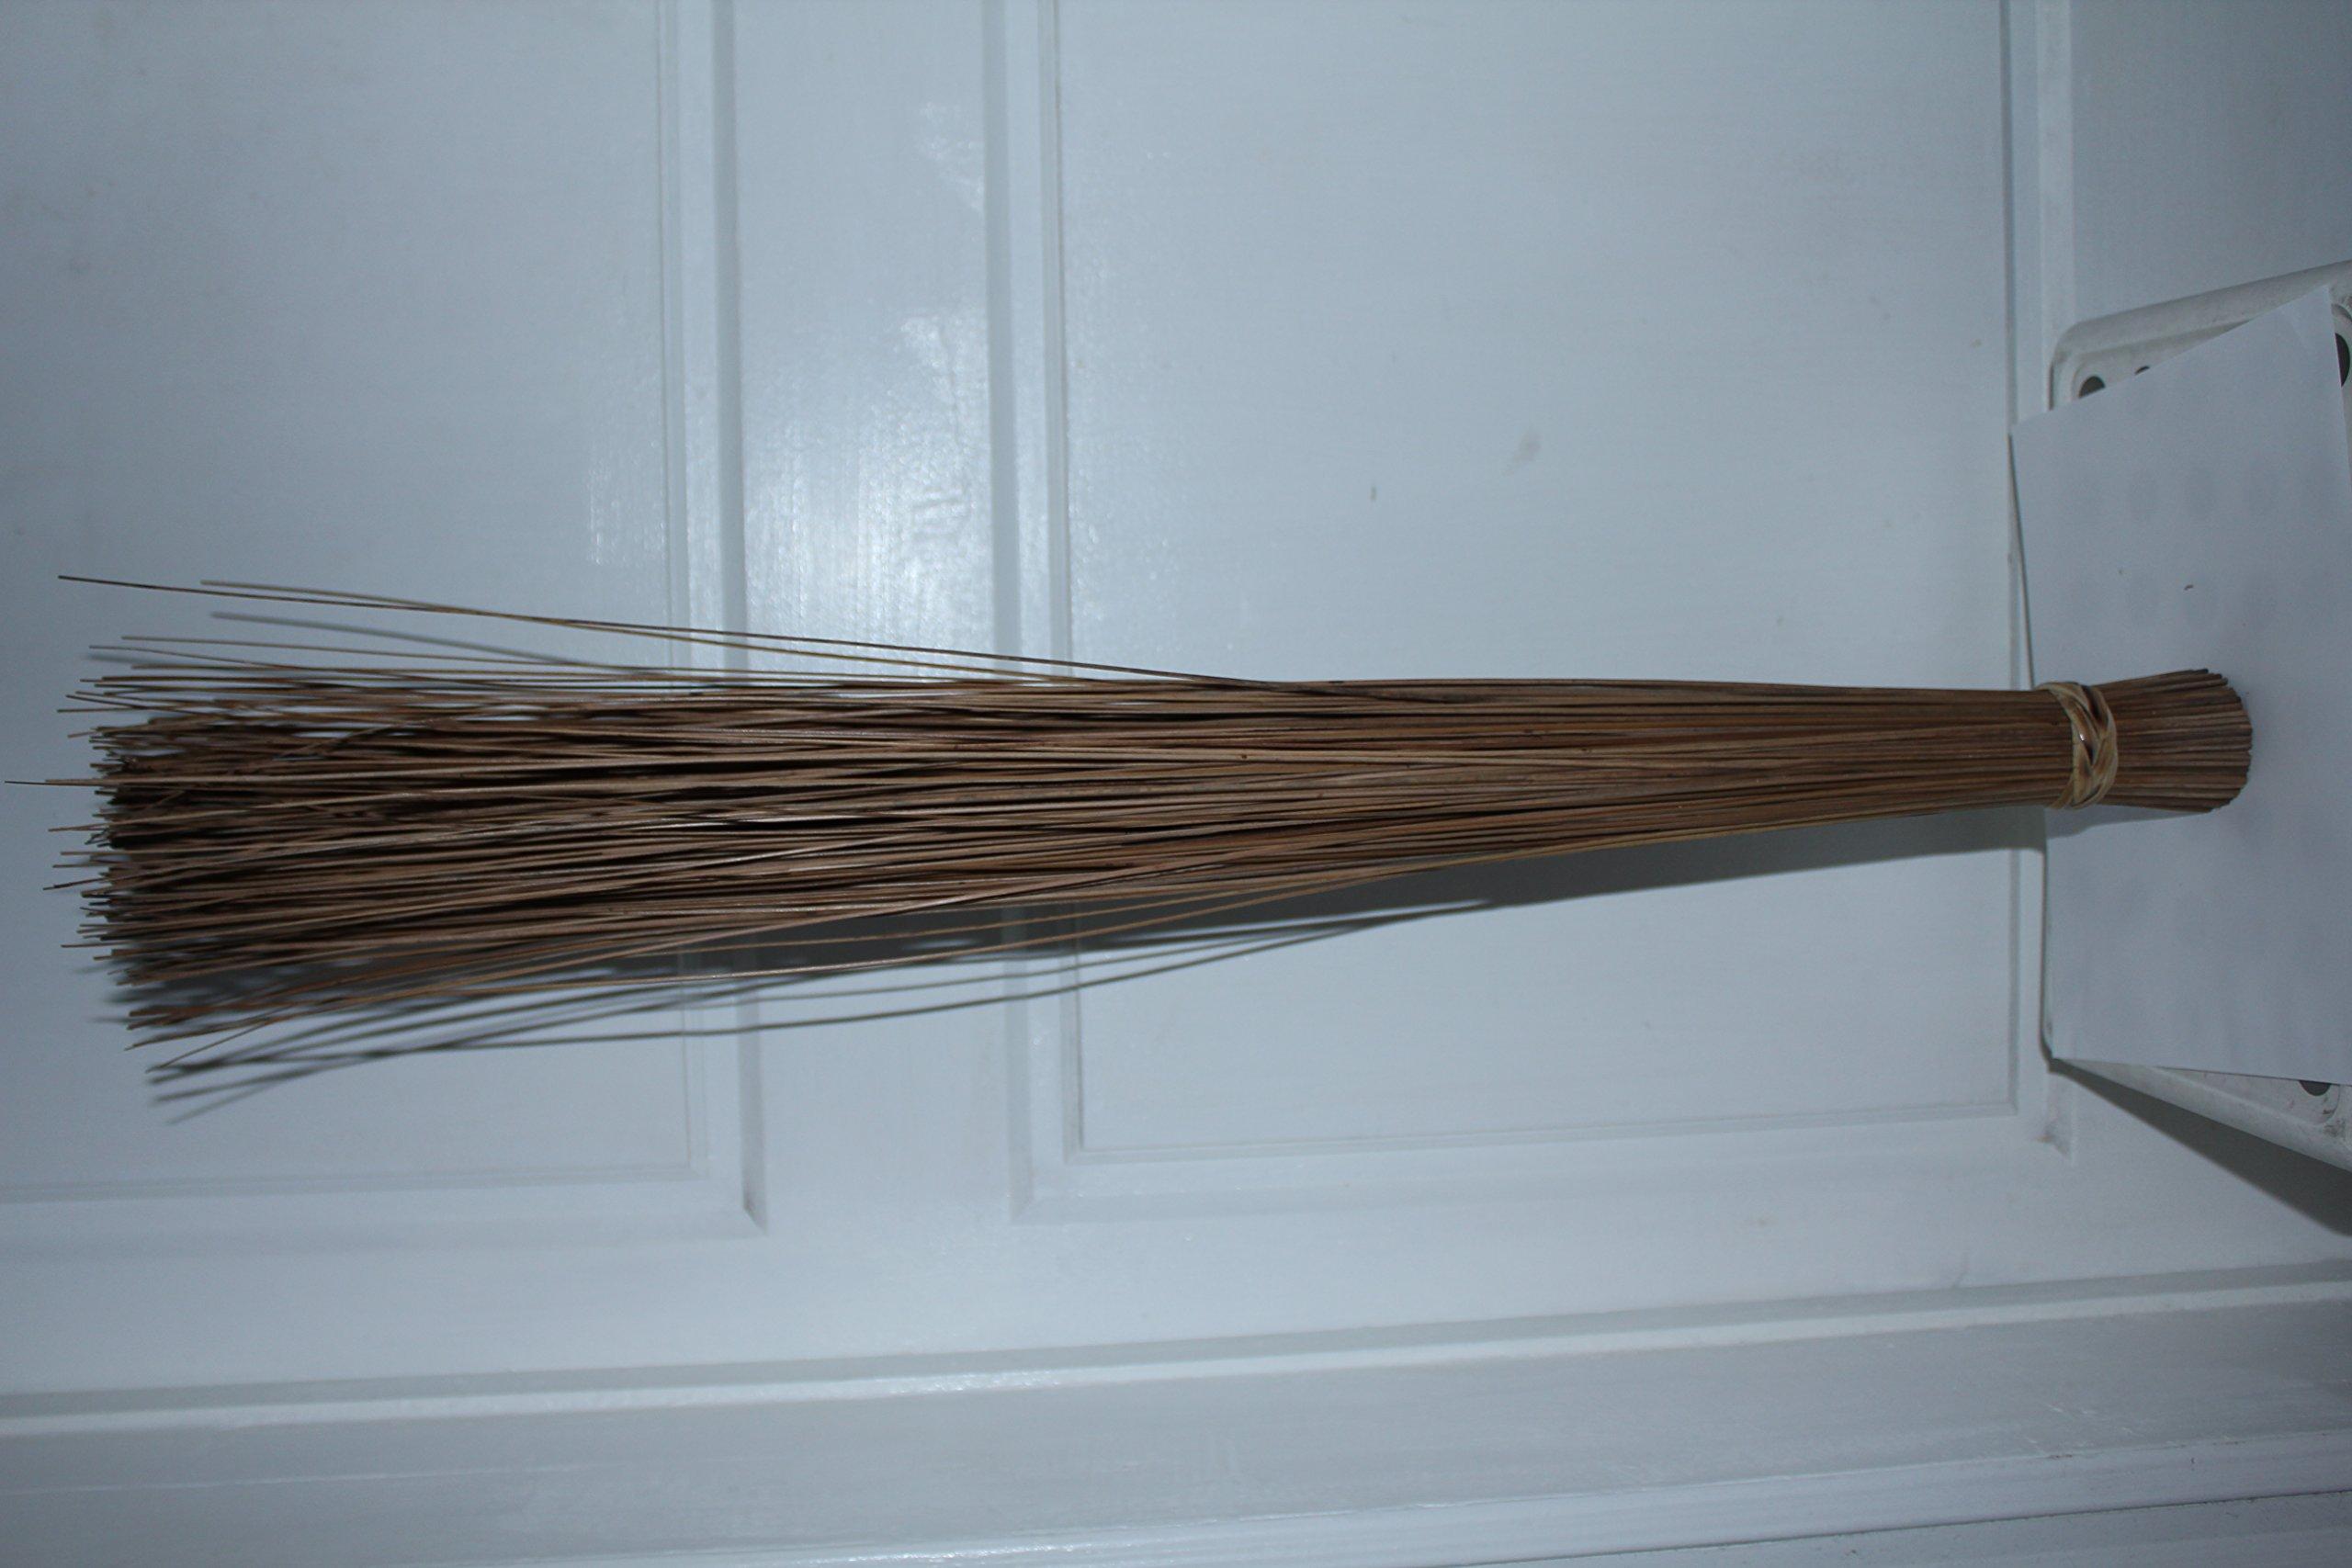 Cheap Flat Broom Stick, find Flat Broom Stick deals on line at ...